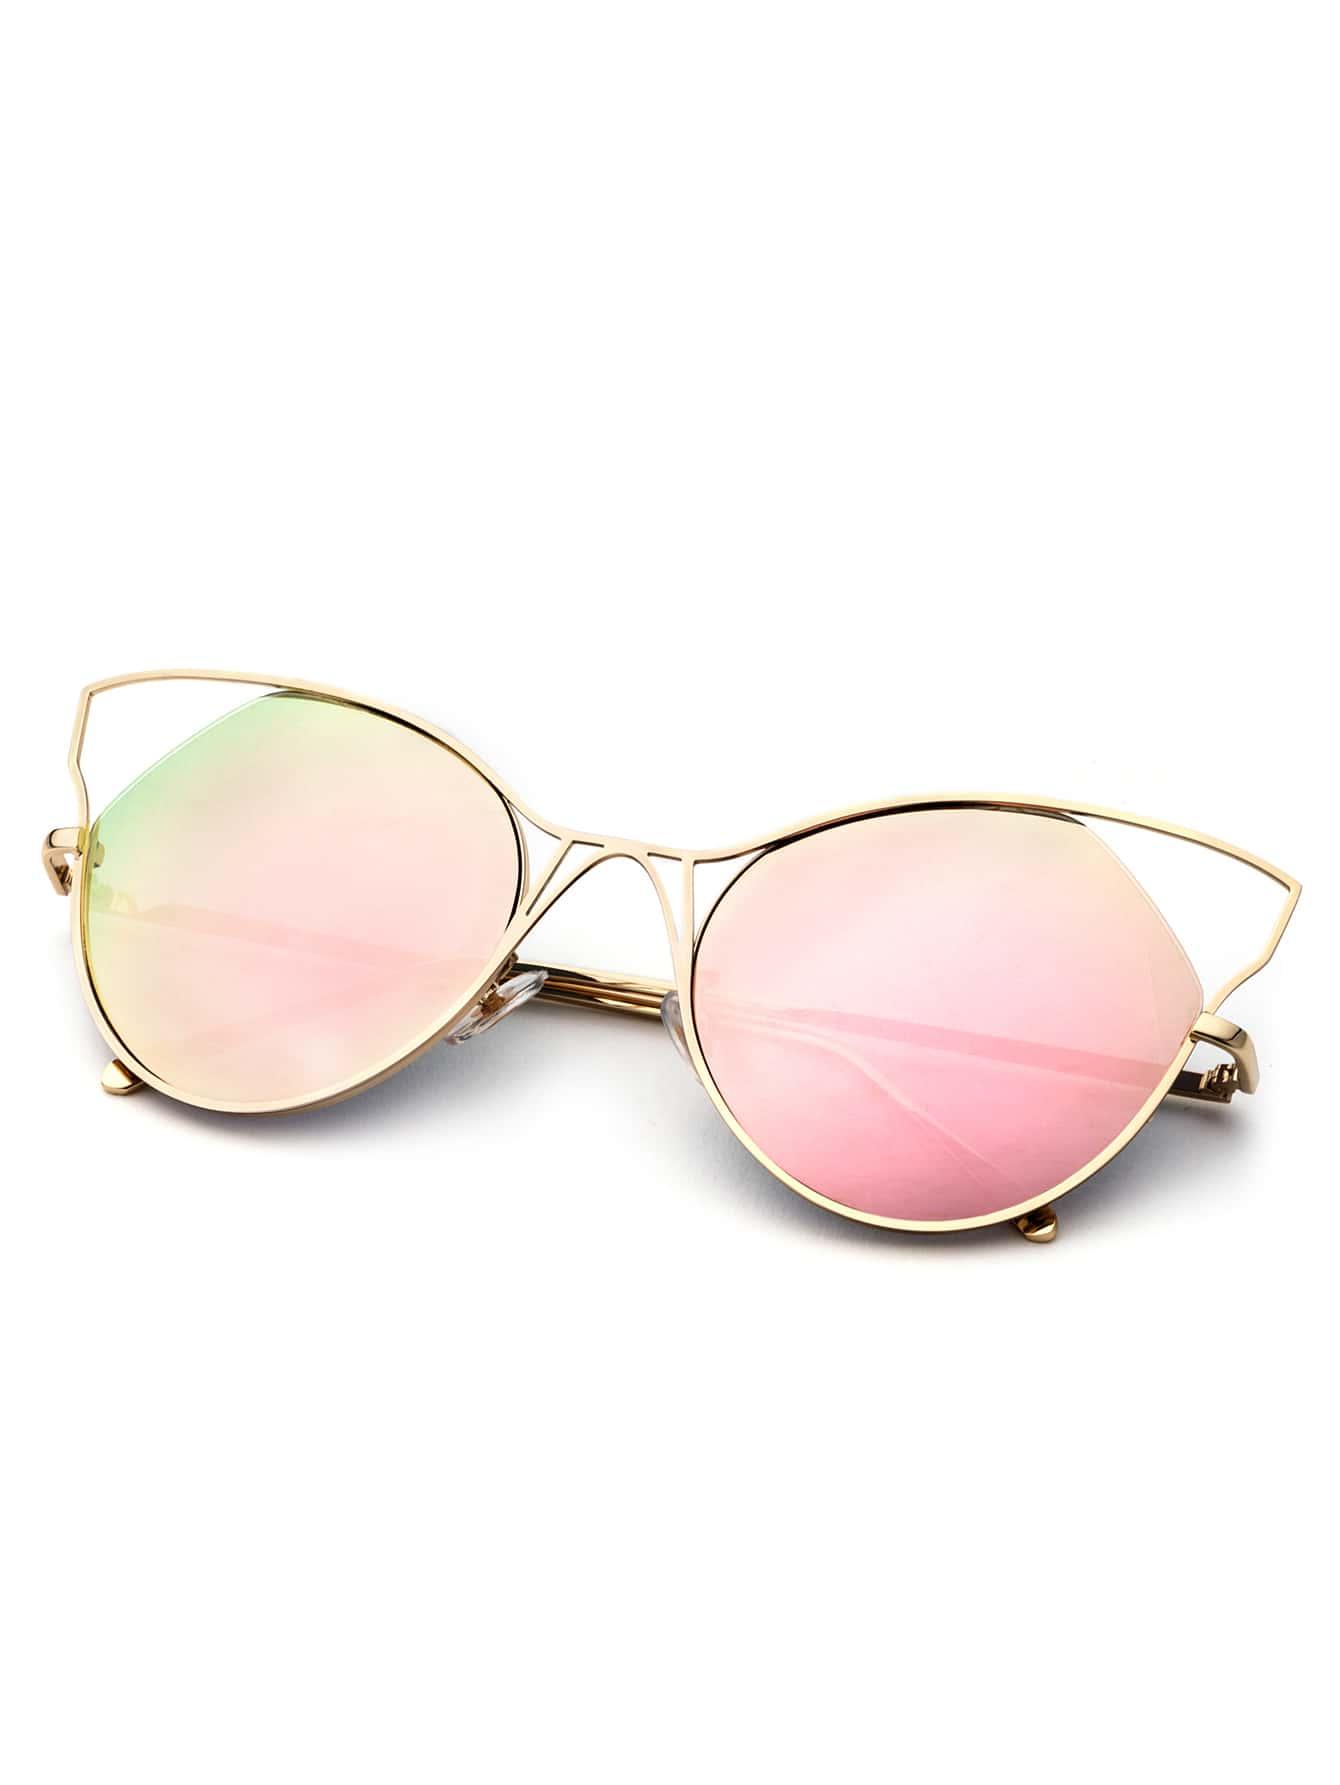 Gold Frame Pink Cat Eye Sunglasses -SheIn(Sheinside)